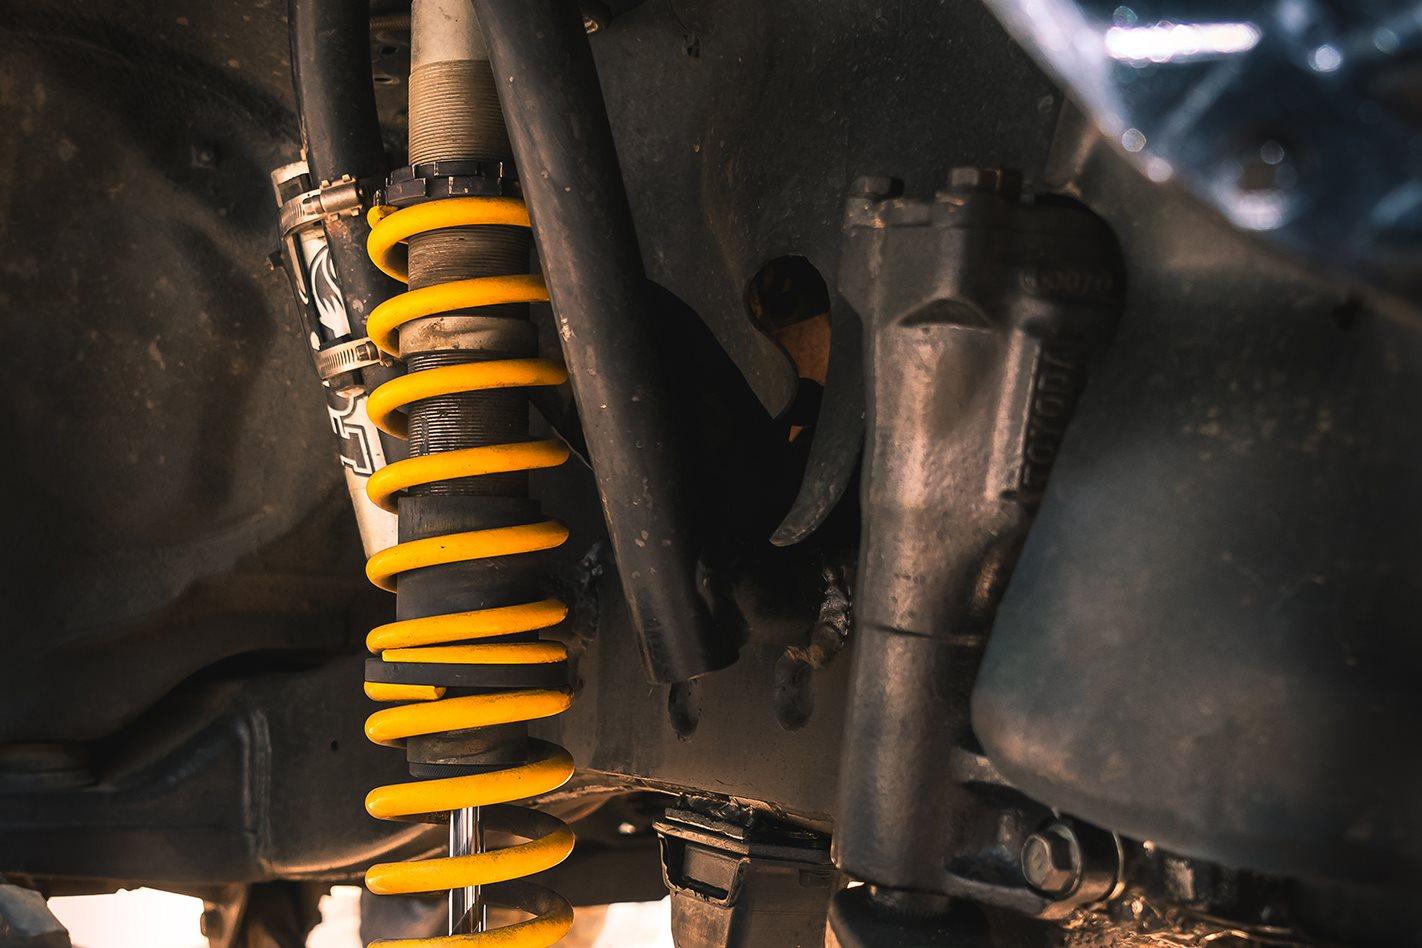 2015-Toyota-Hilux-suspension-coils.jpg